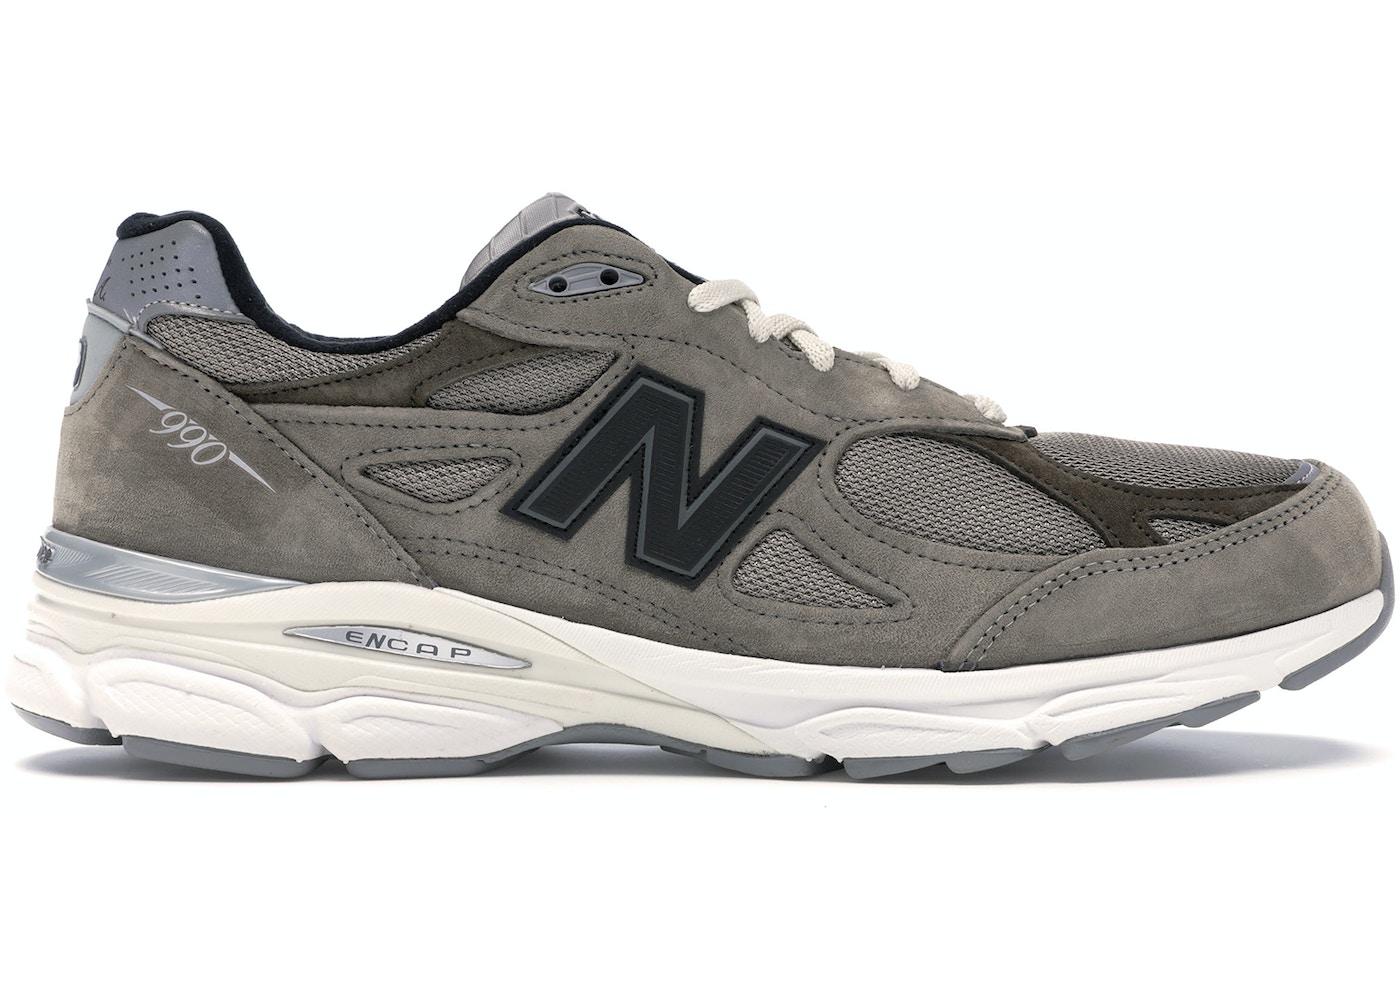 buy popular c8ae7 1f879 New Balance Shoes - Highest Bid